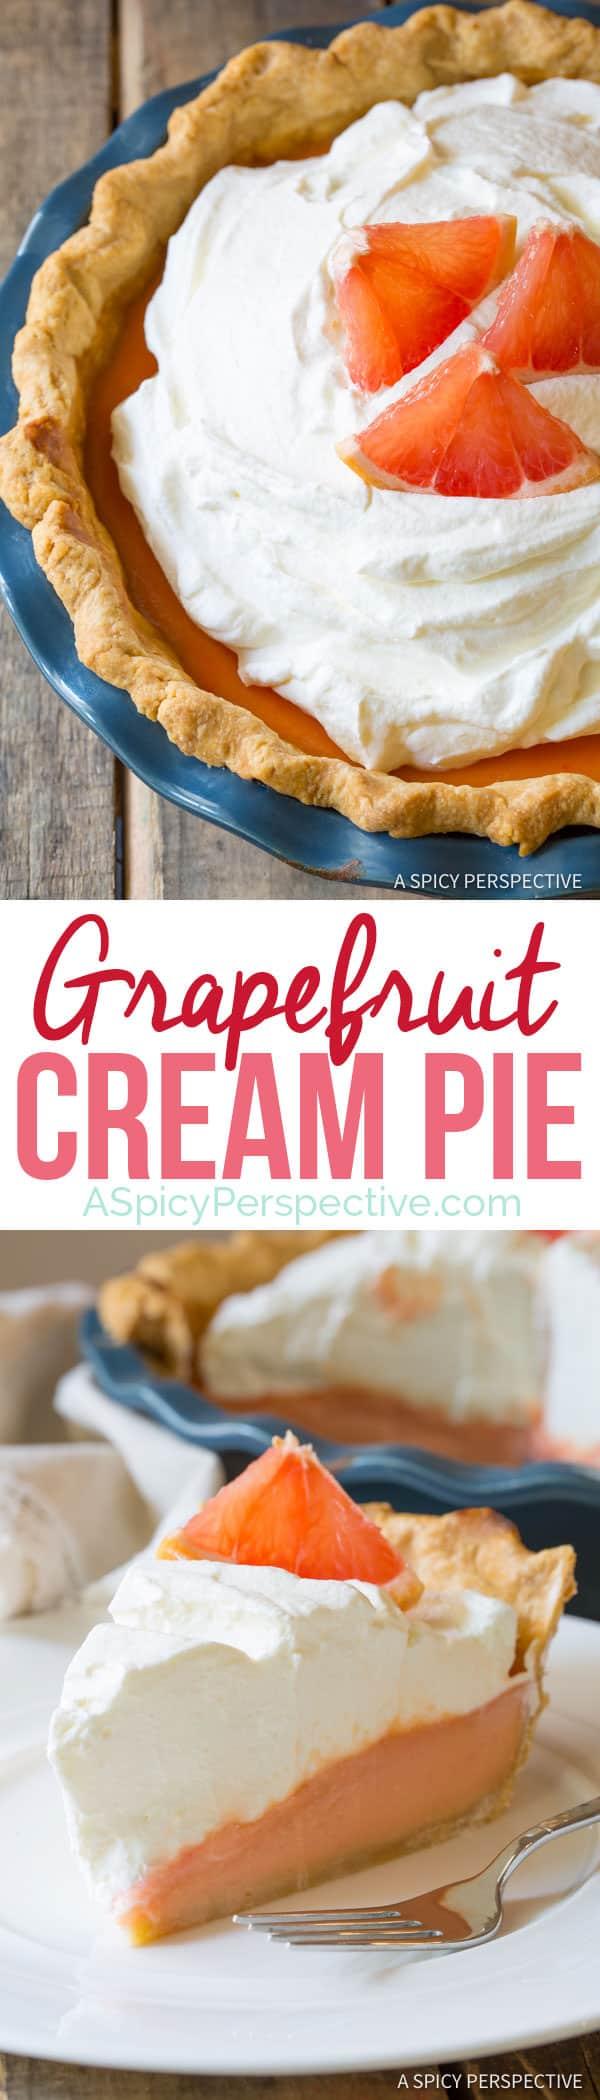 Ruby Red Grapefruit Cream Pie   ASpicyPerspective.com